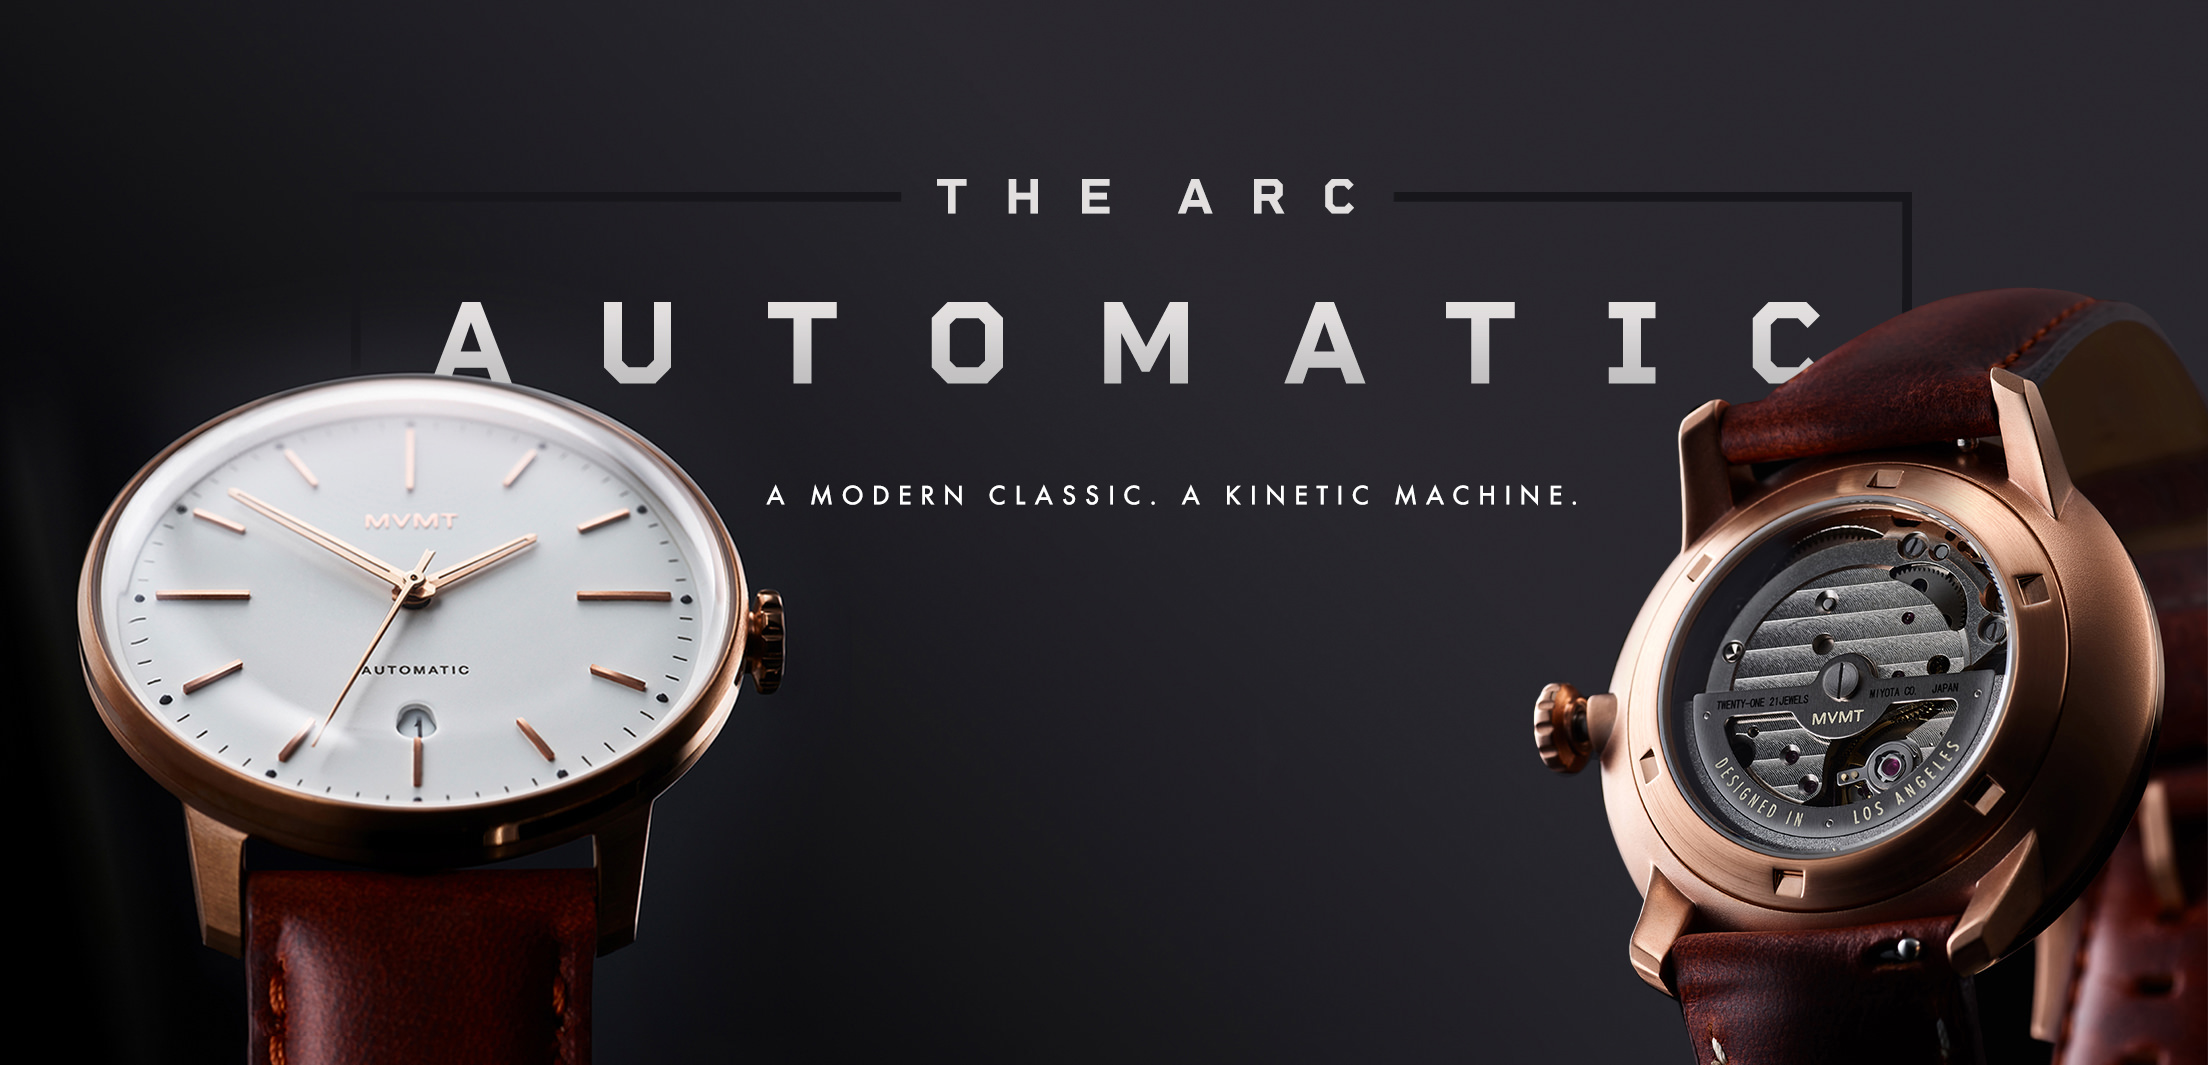 The Arc Automatic. A modern classic. A kinetic machine.